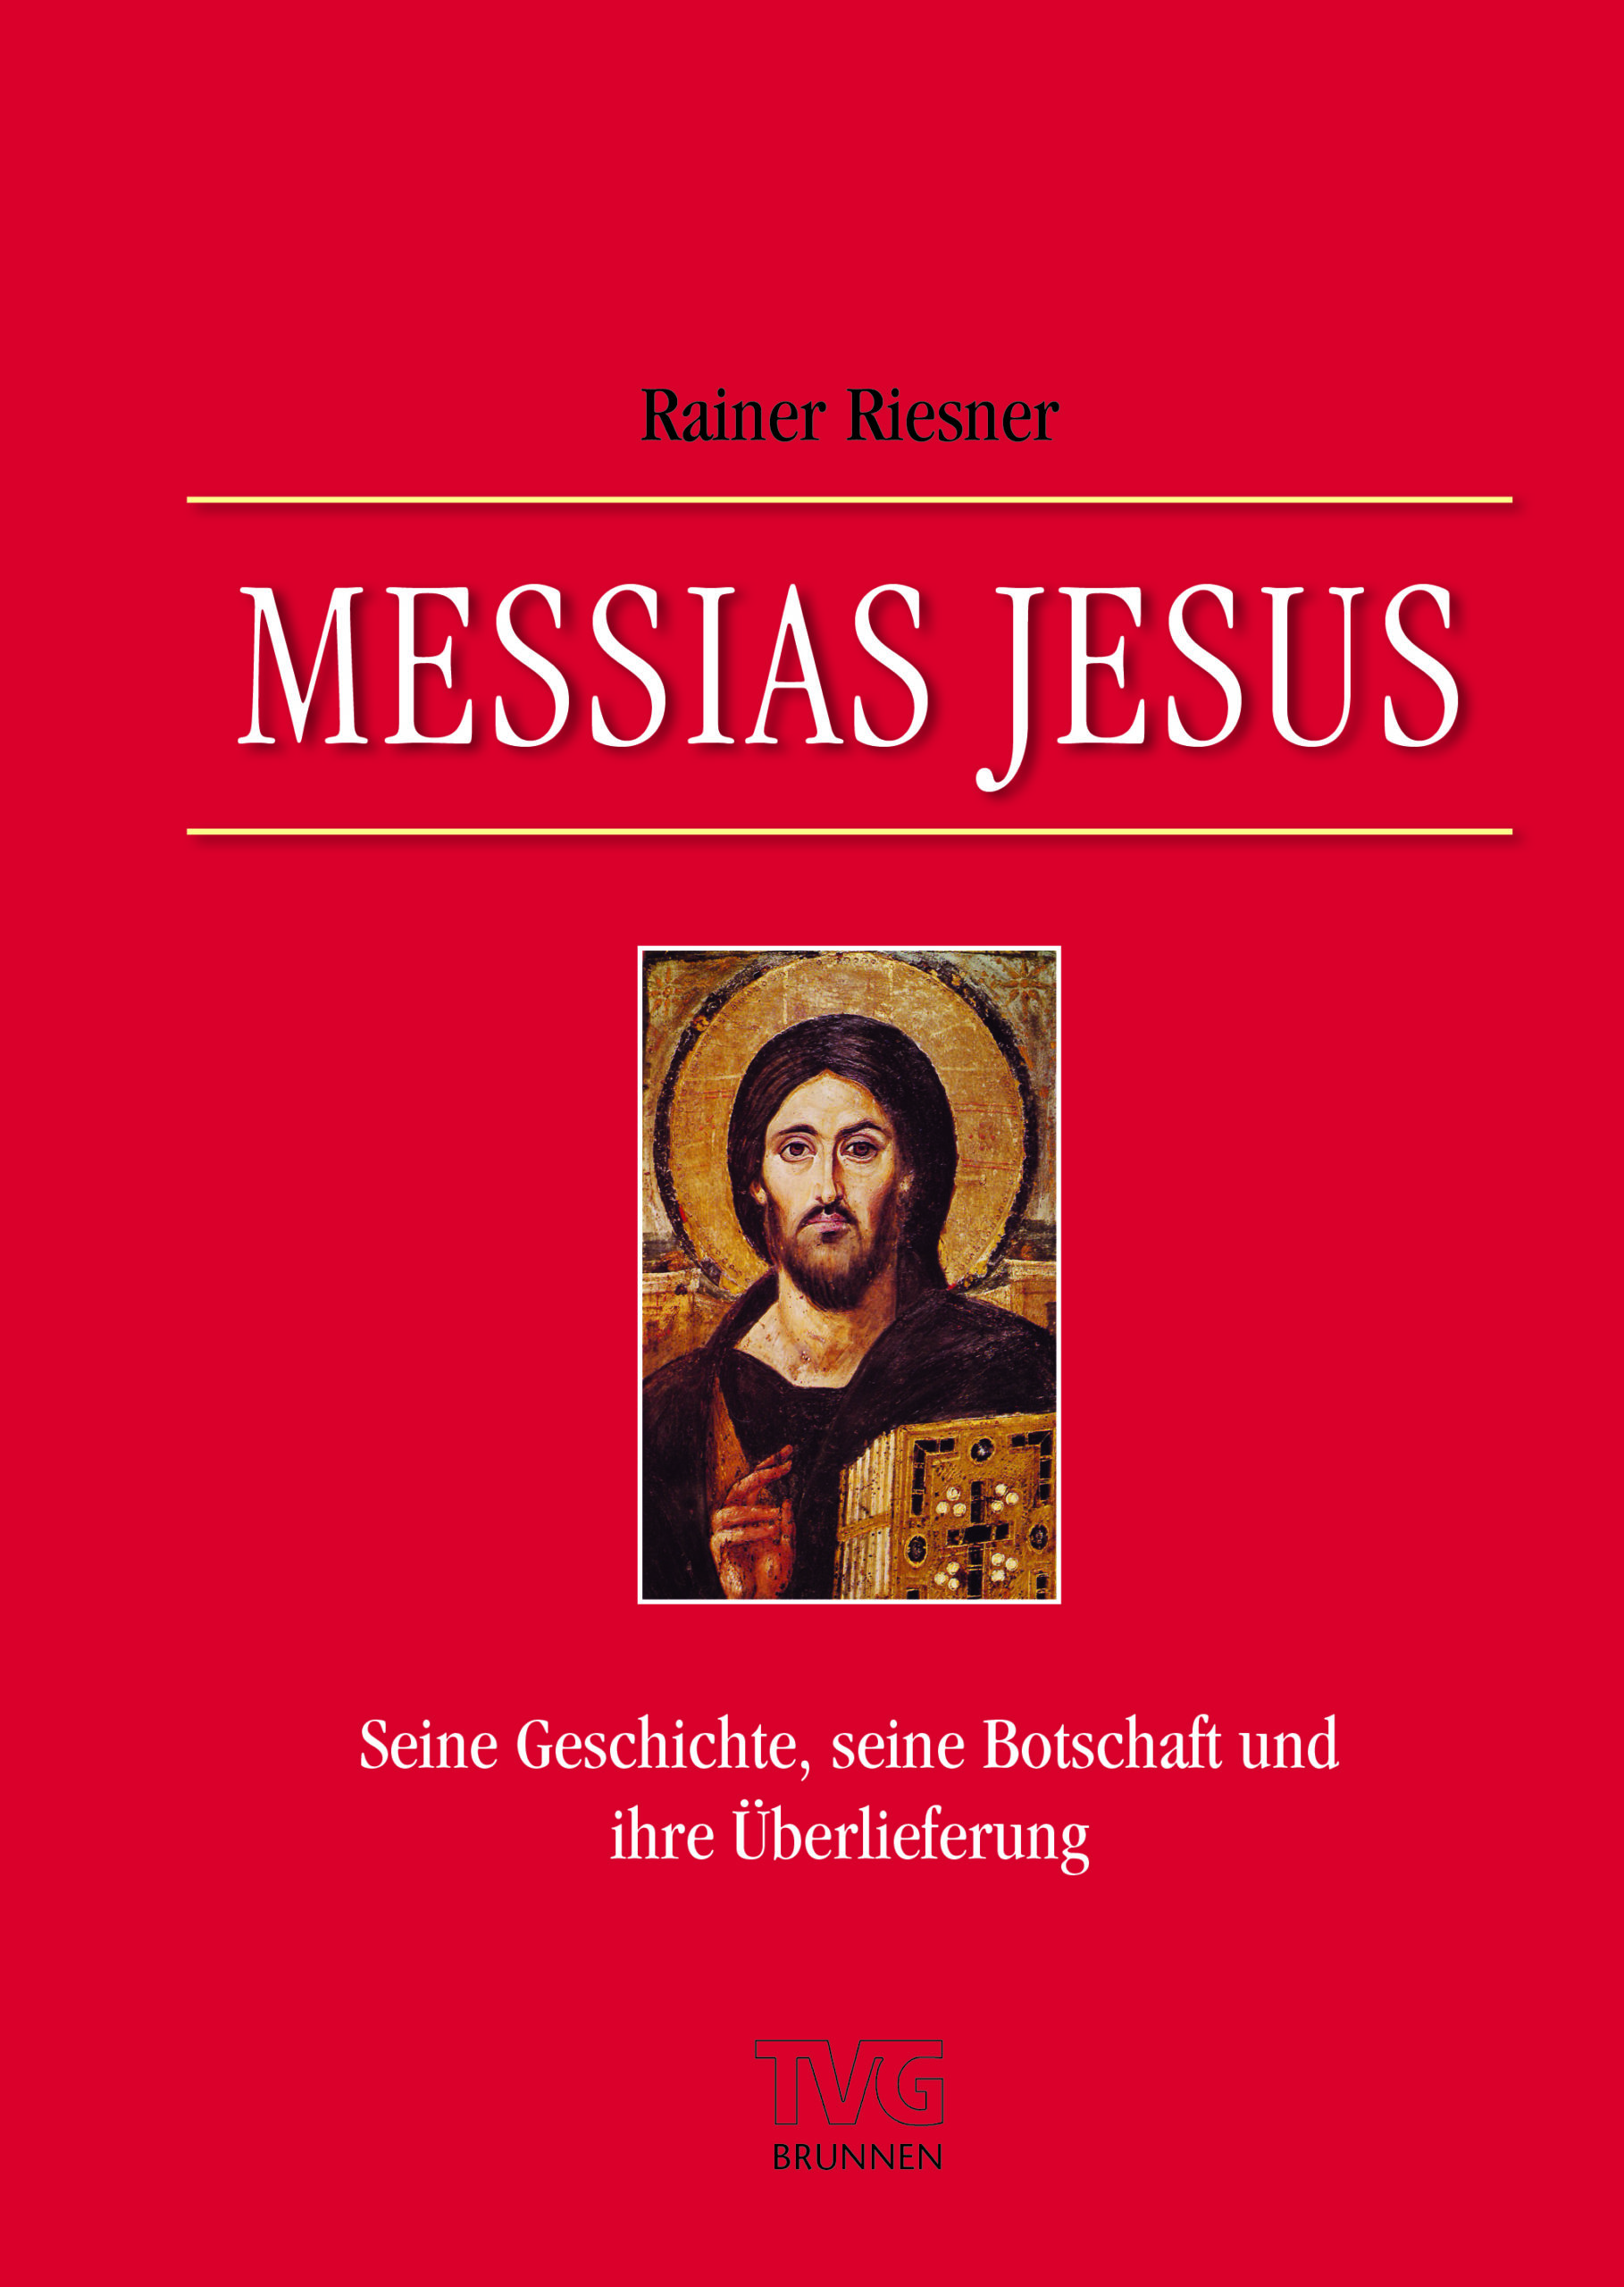 Rainer Riesner: Messias Jesus